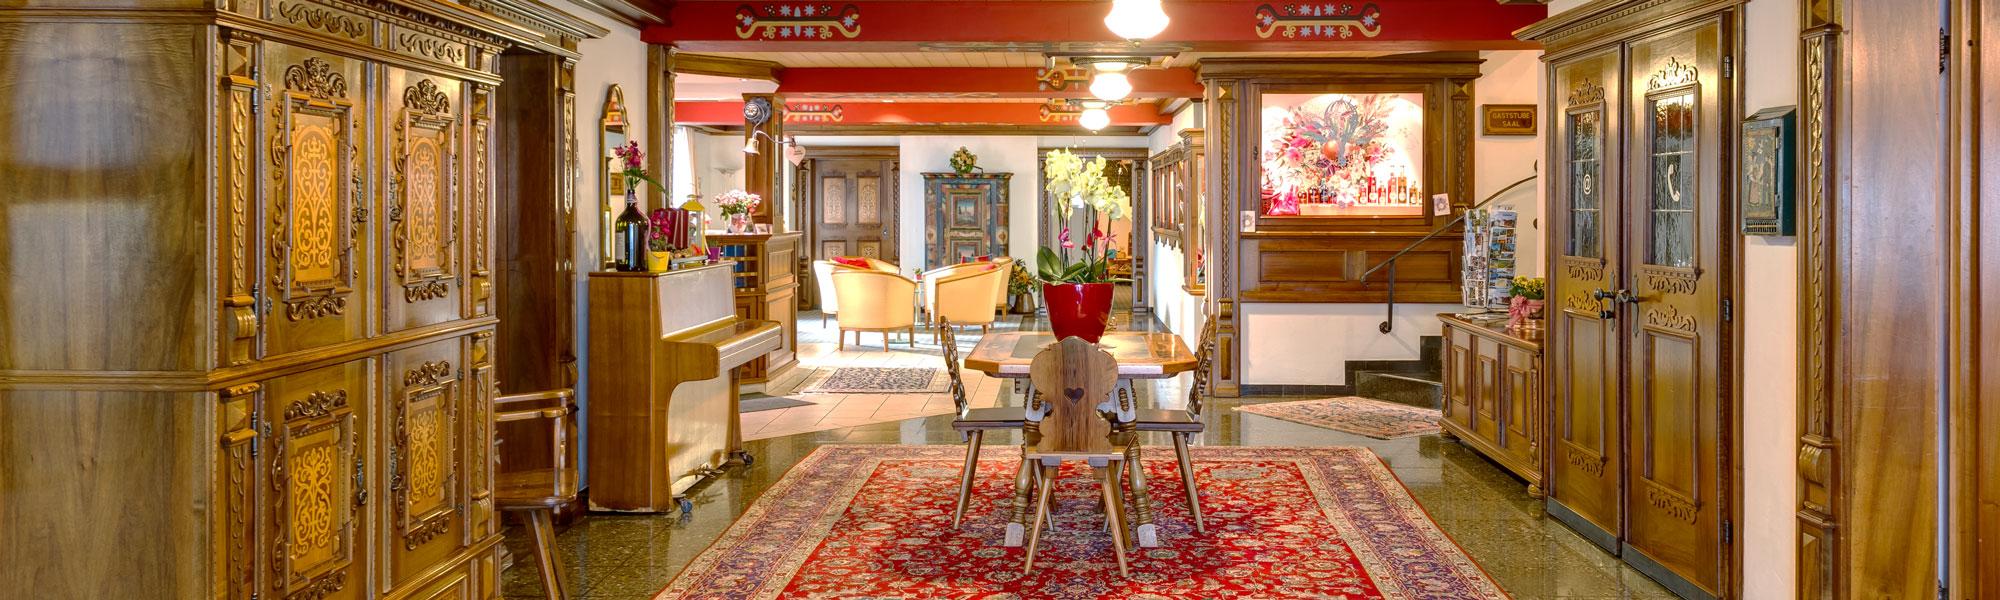 Header-ueber-uns-044_Romantik_Hotel_Saentis_